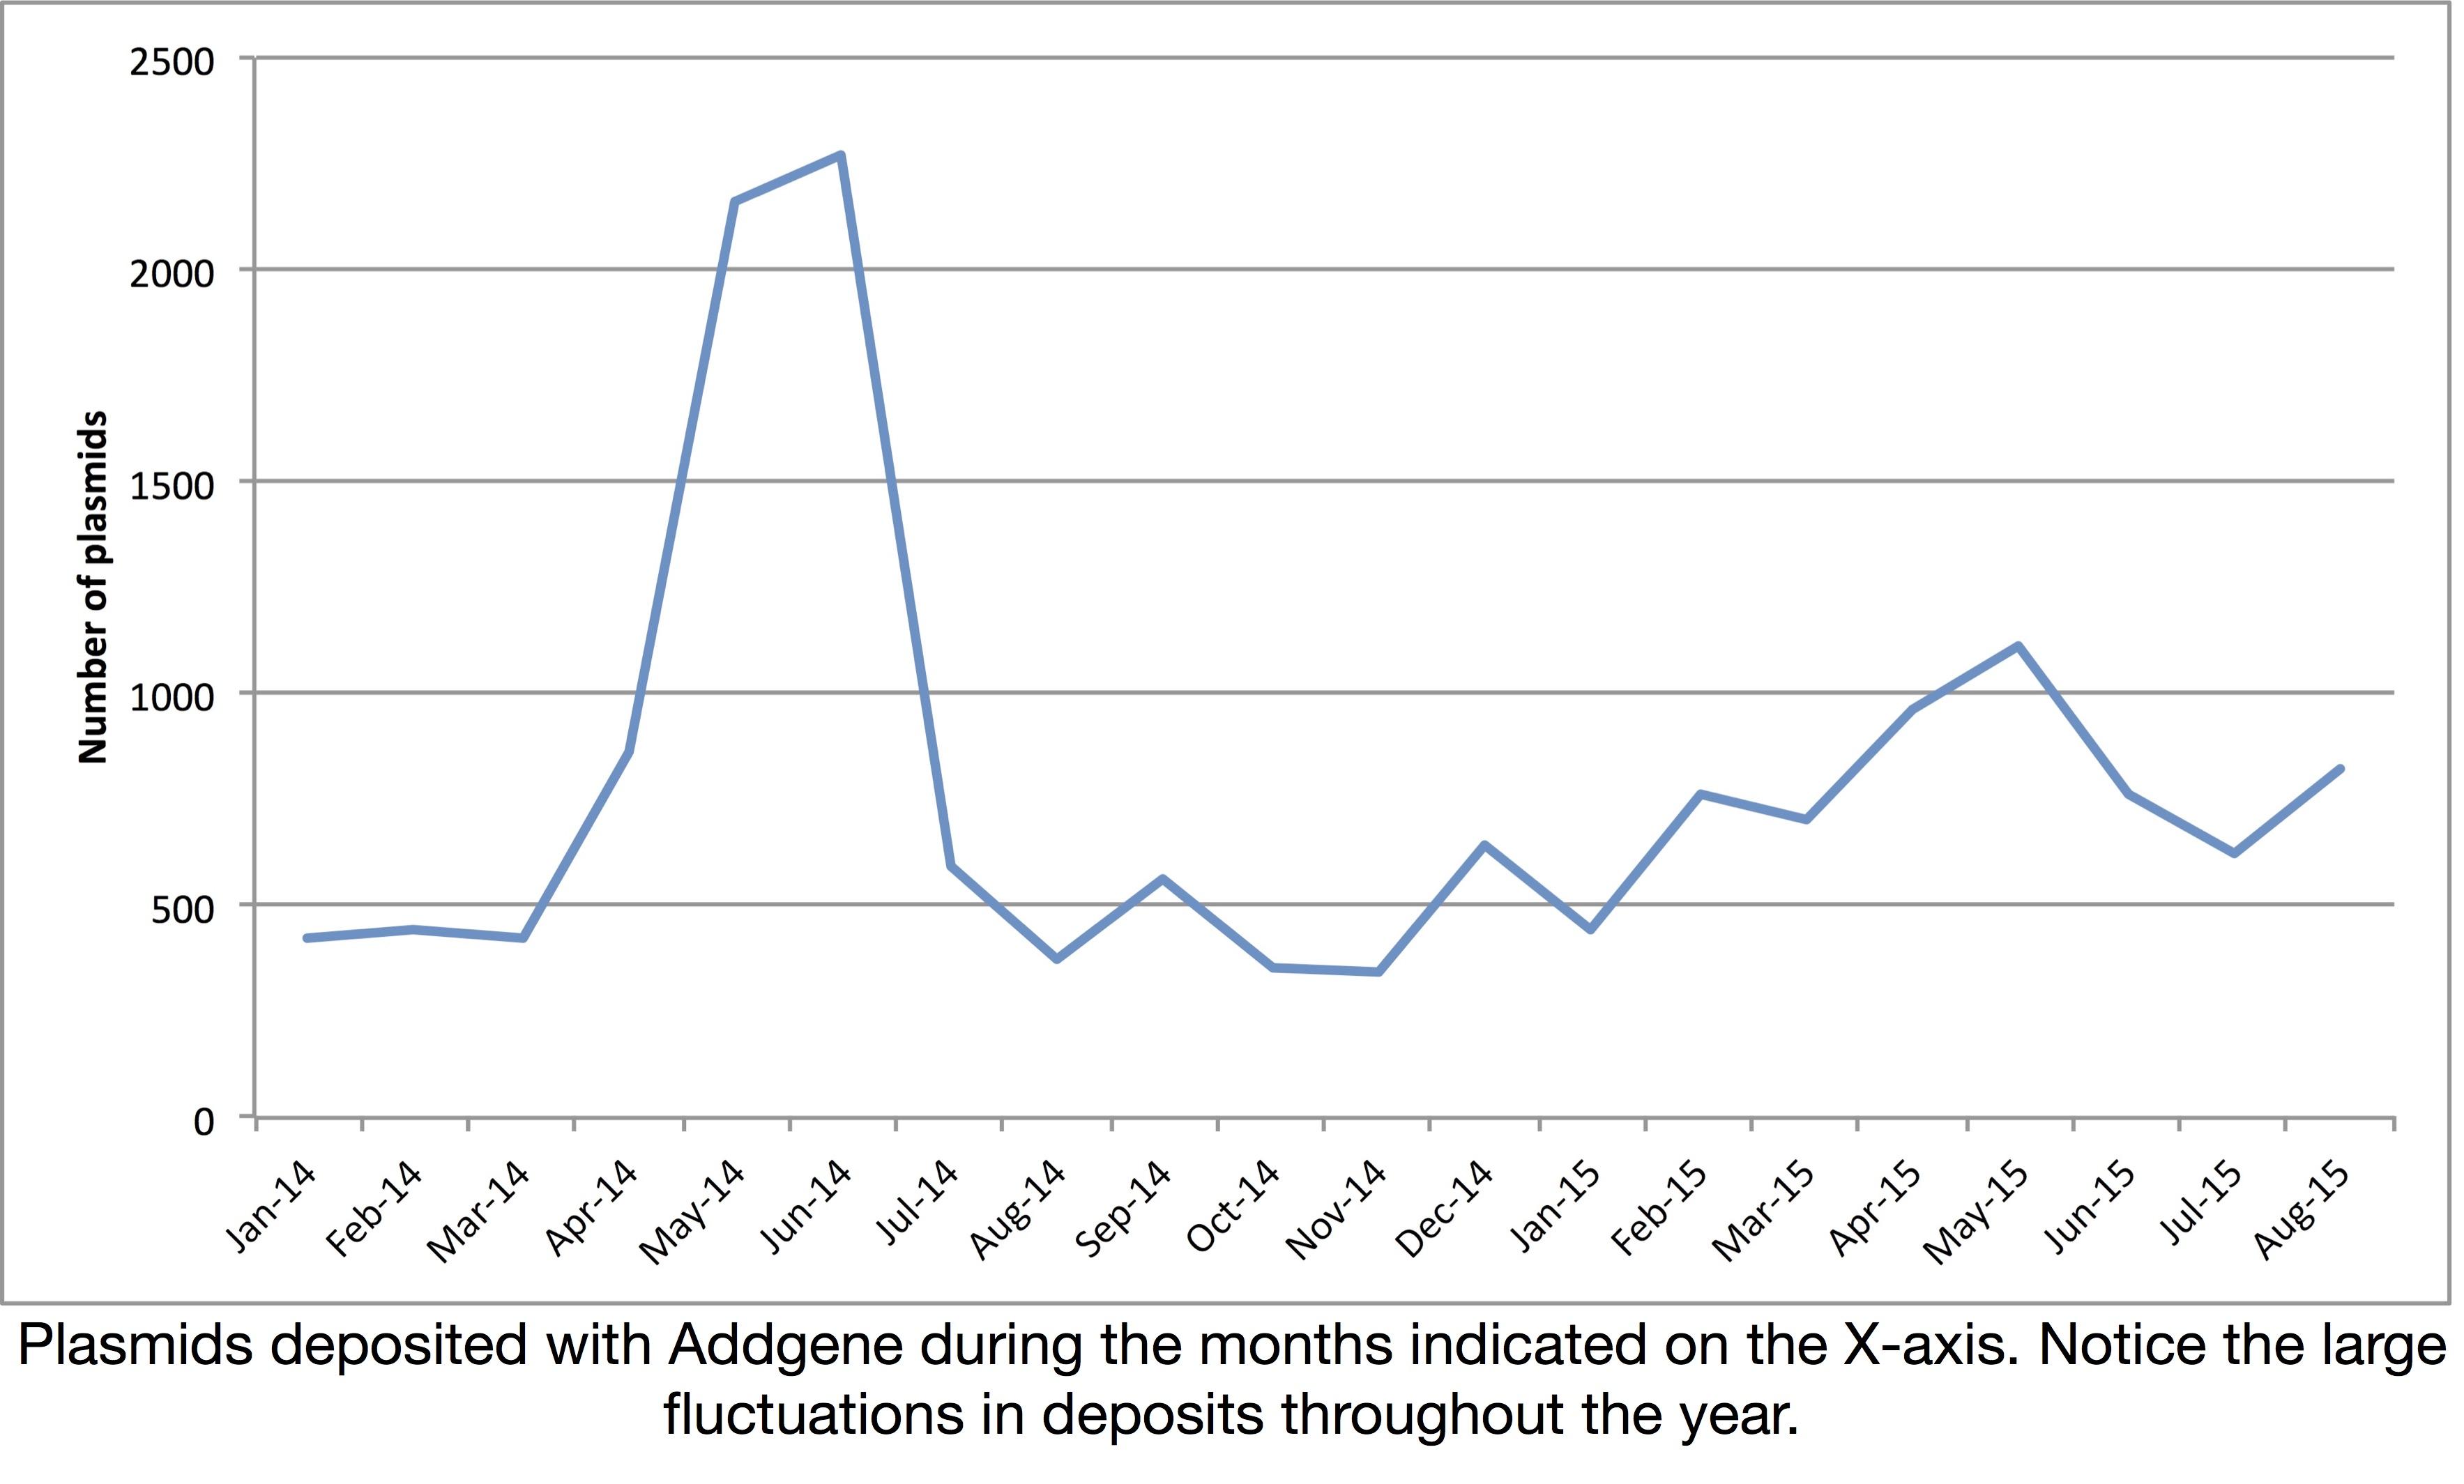 Monthly plasmid deposits at Addgene